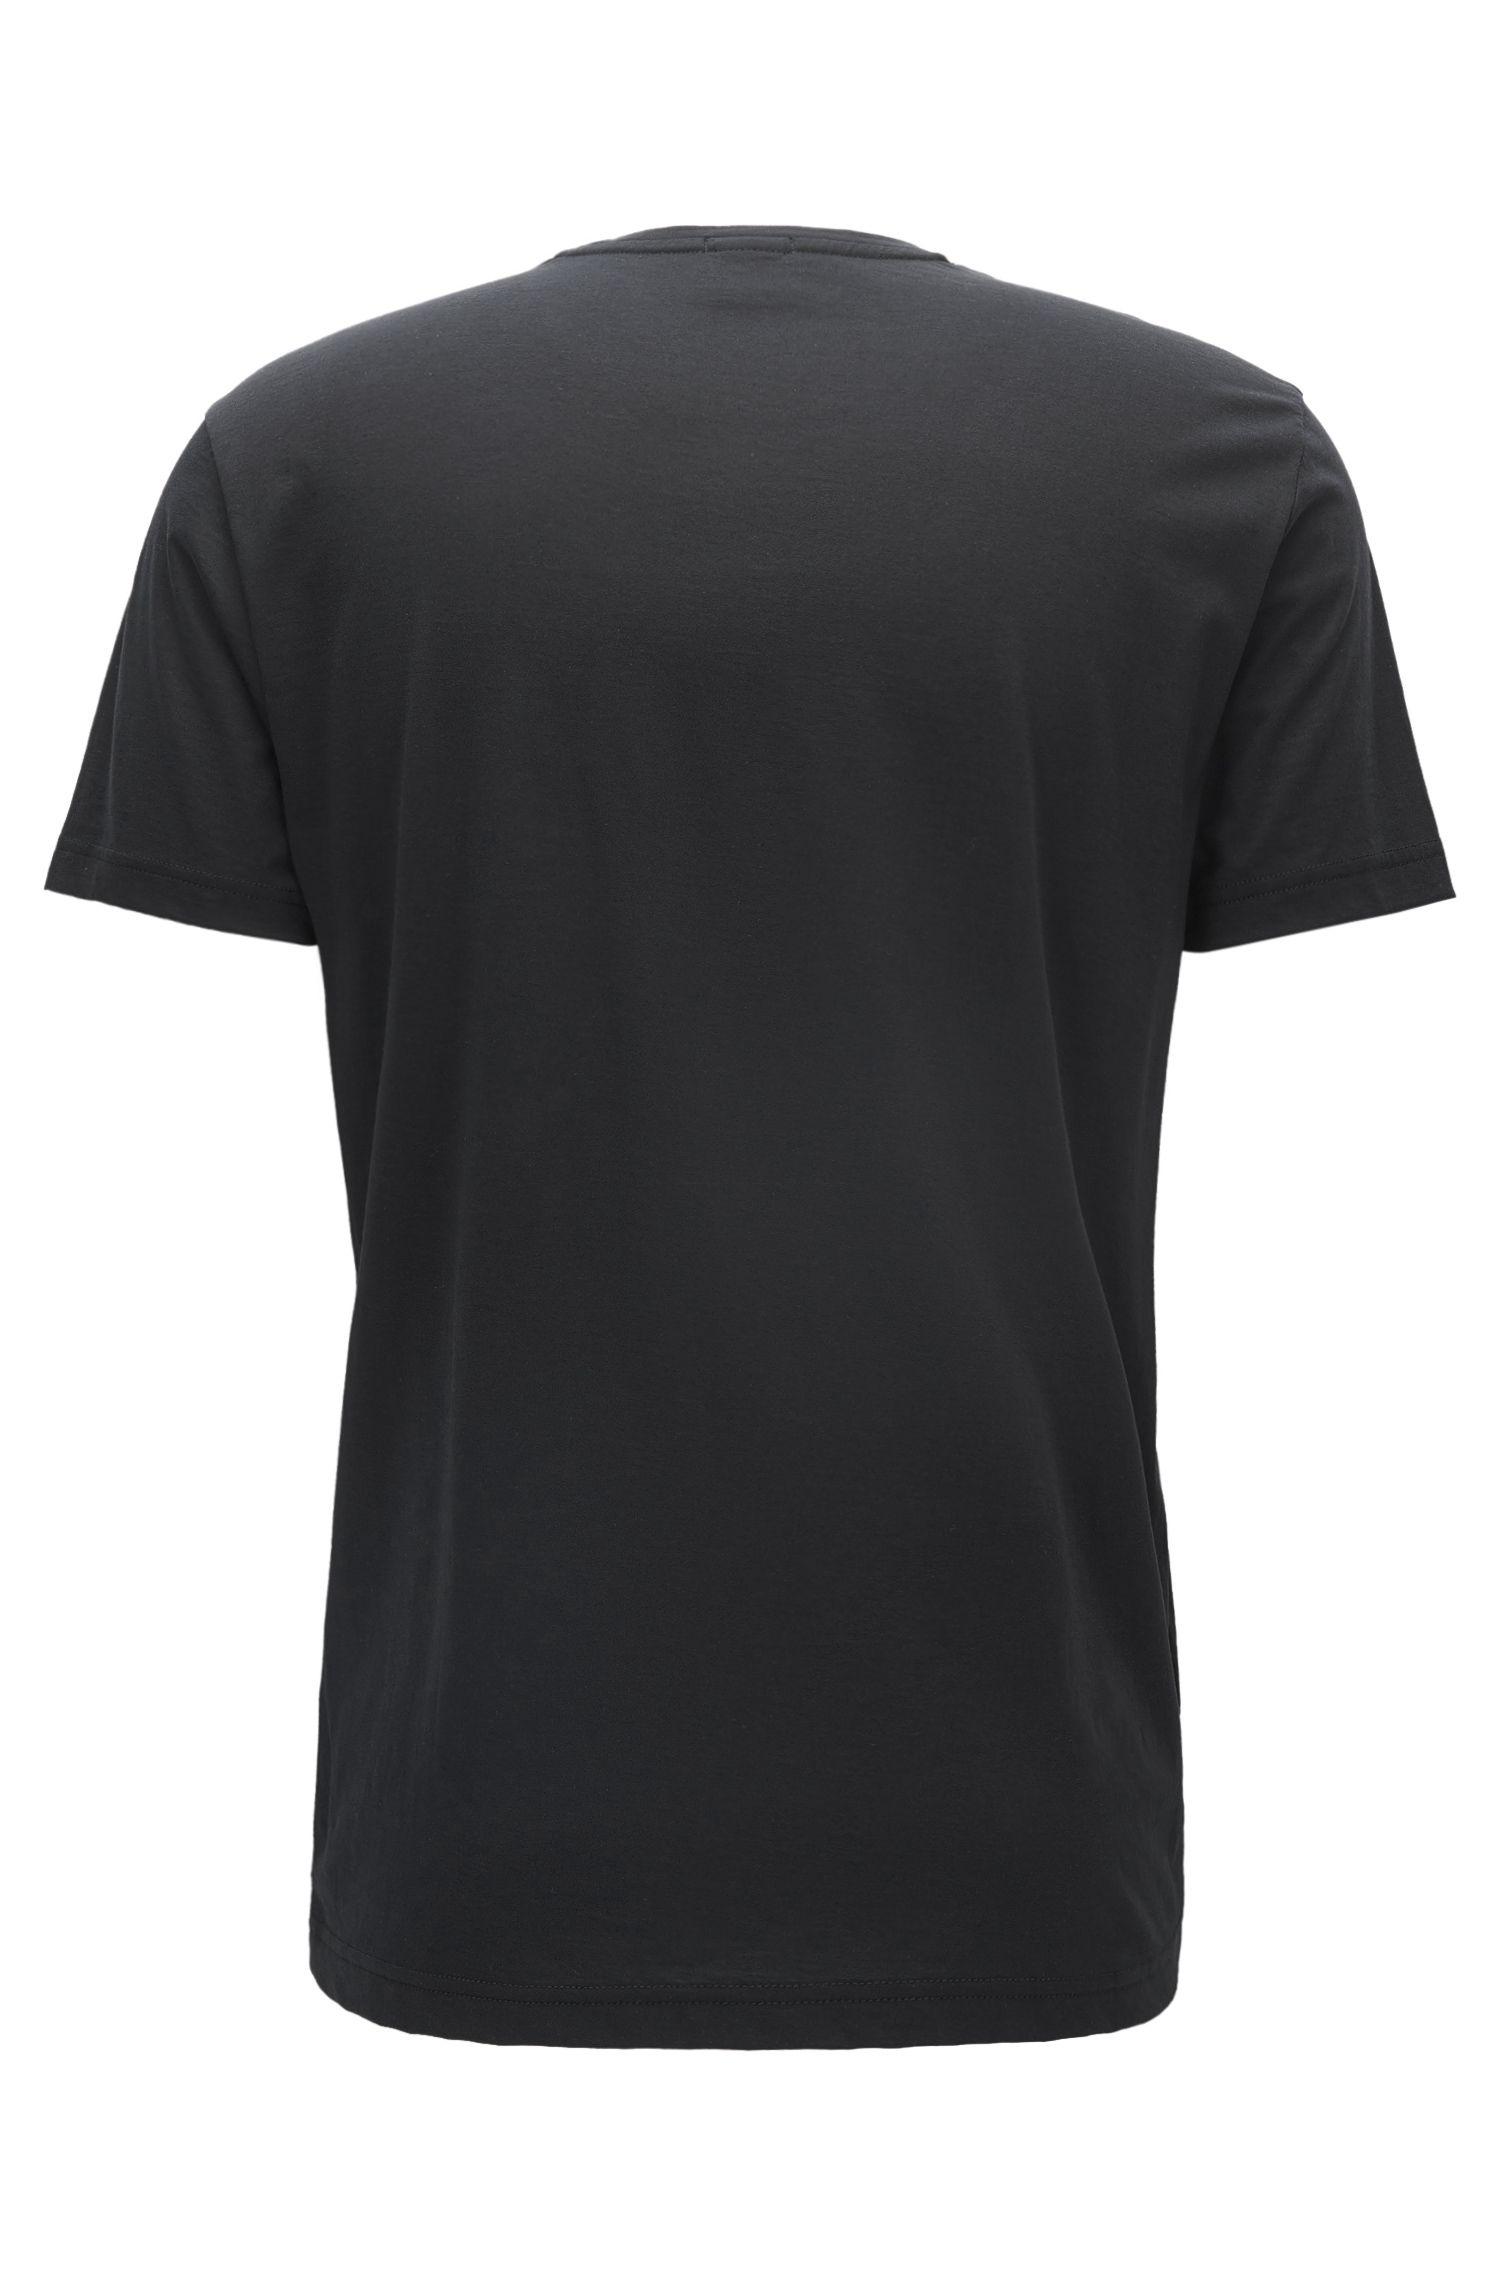 Mesh-Print Cotton Graphic T-Shirt | Tee, Black